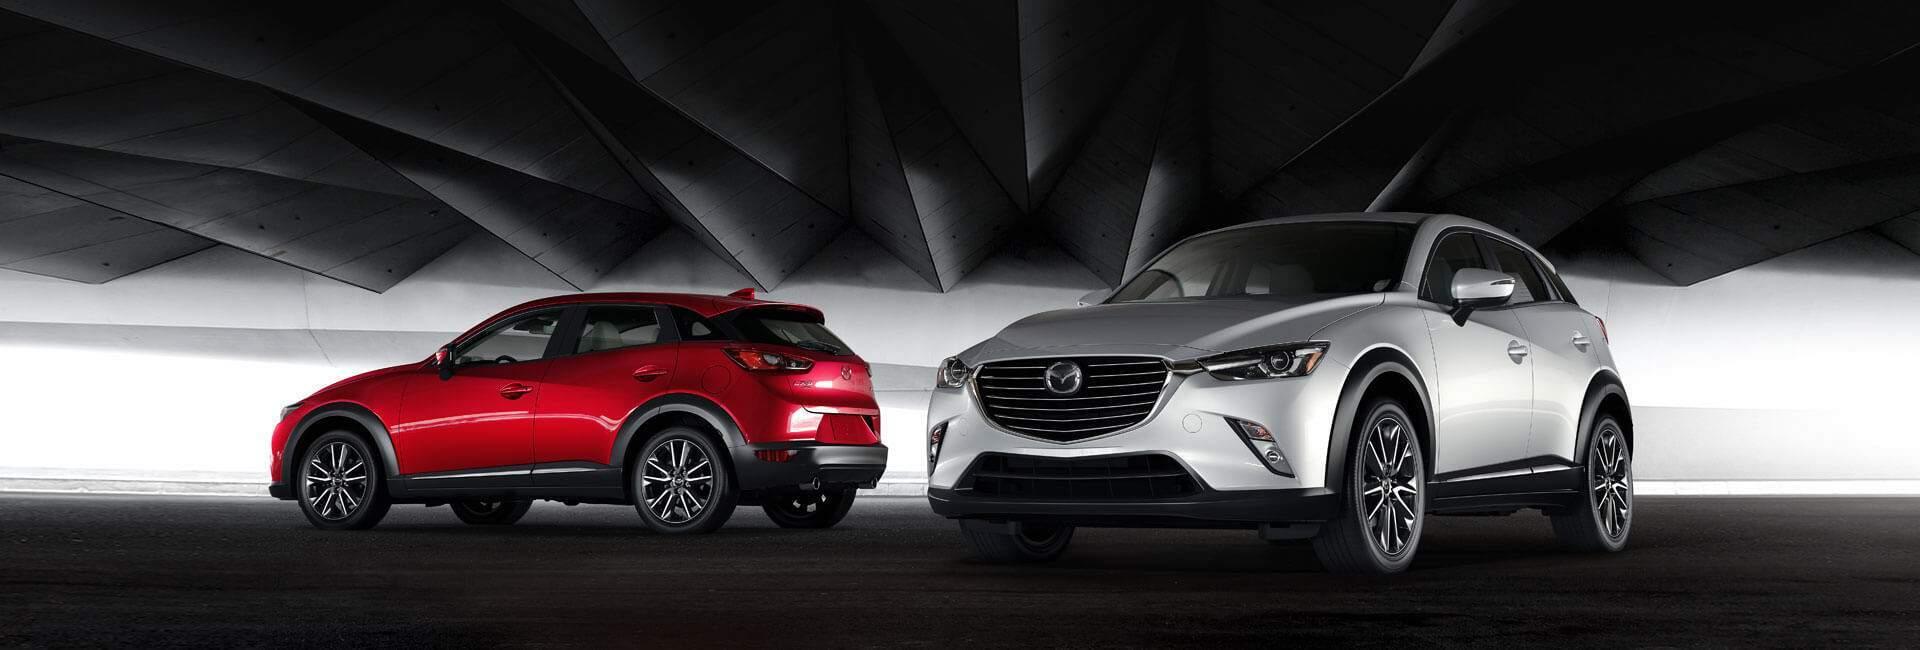 Mazda Dealership Carlsbad CA Used Cars Bob Baker Auto Group